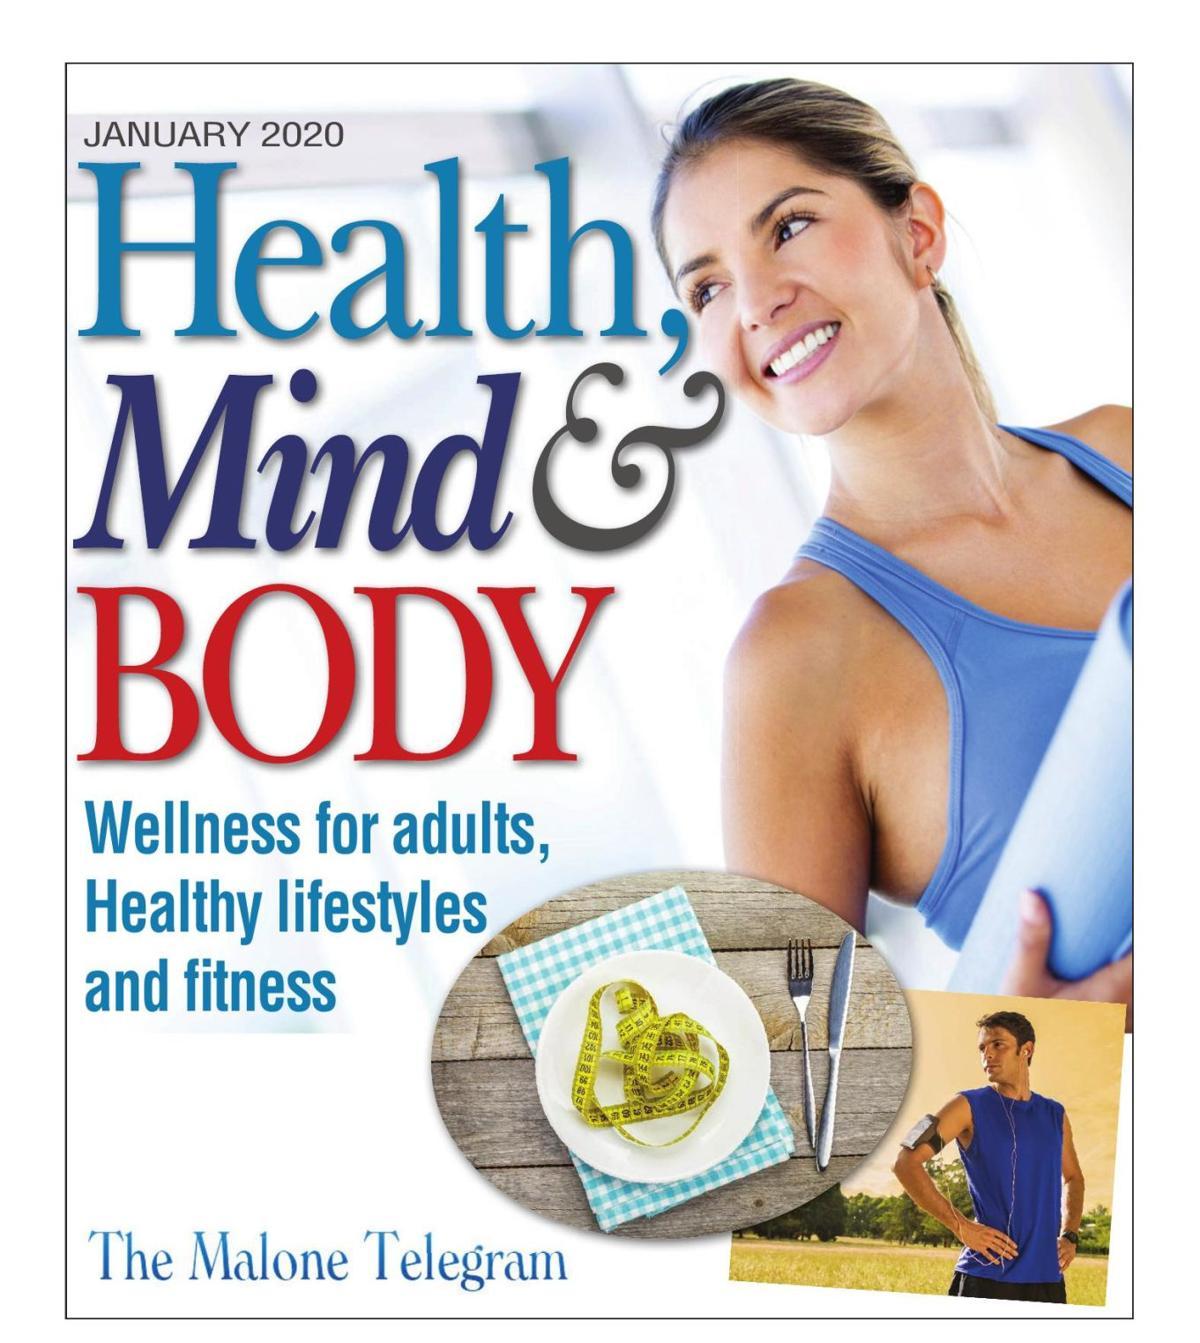 Health-Mind-Body 2020